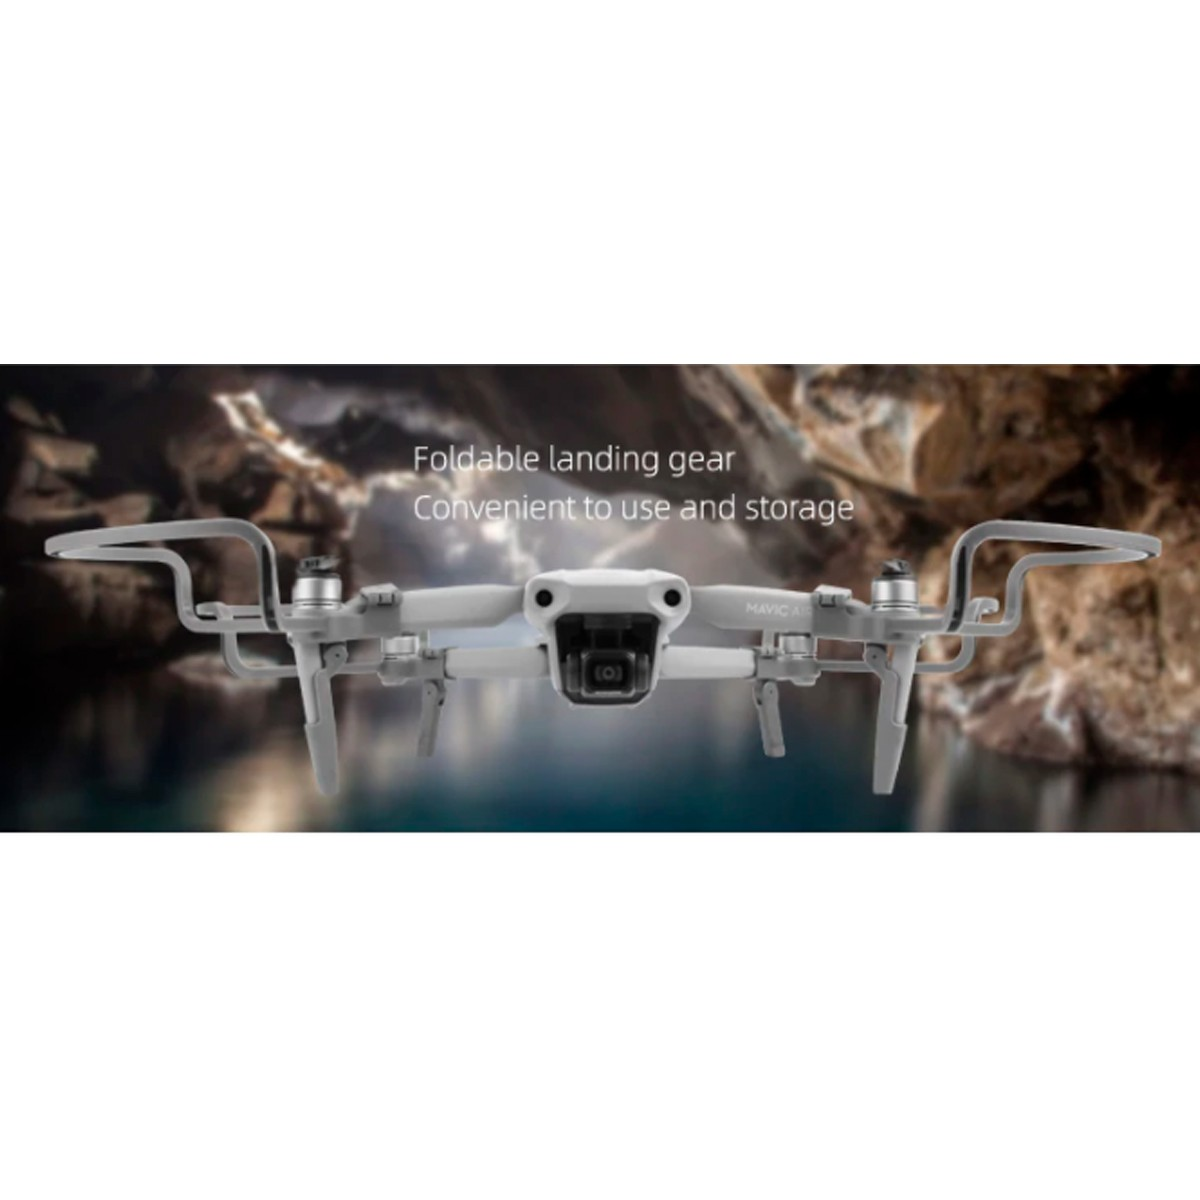 Protetor de Hélices com Trem de Pouso - Drone DJI Mavic Air 2